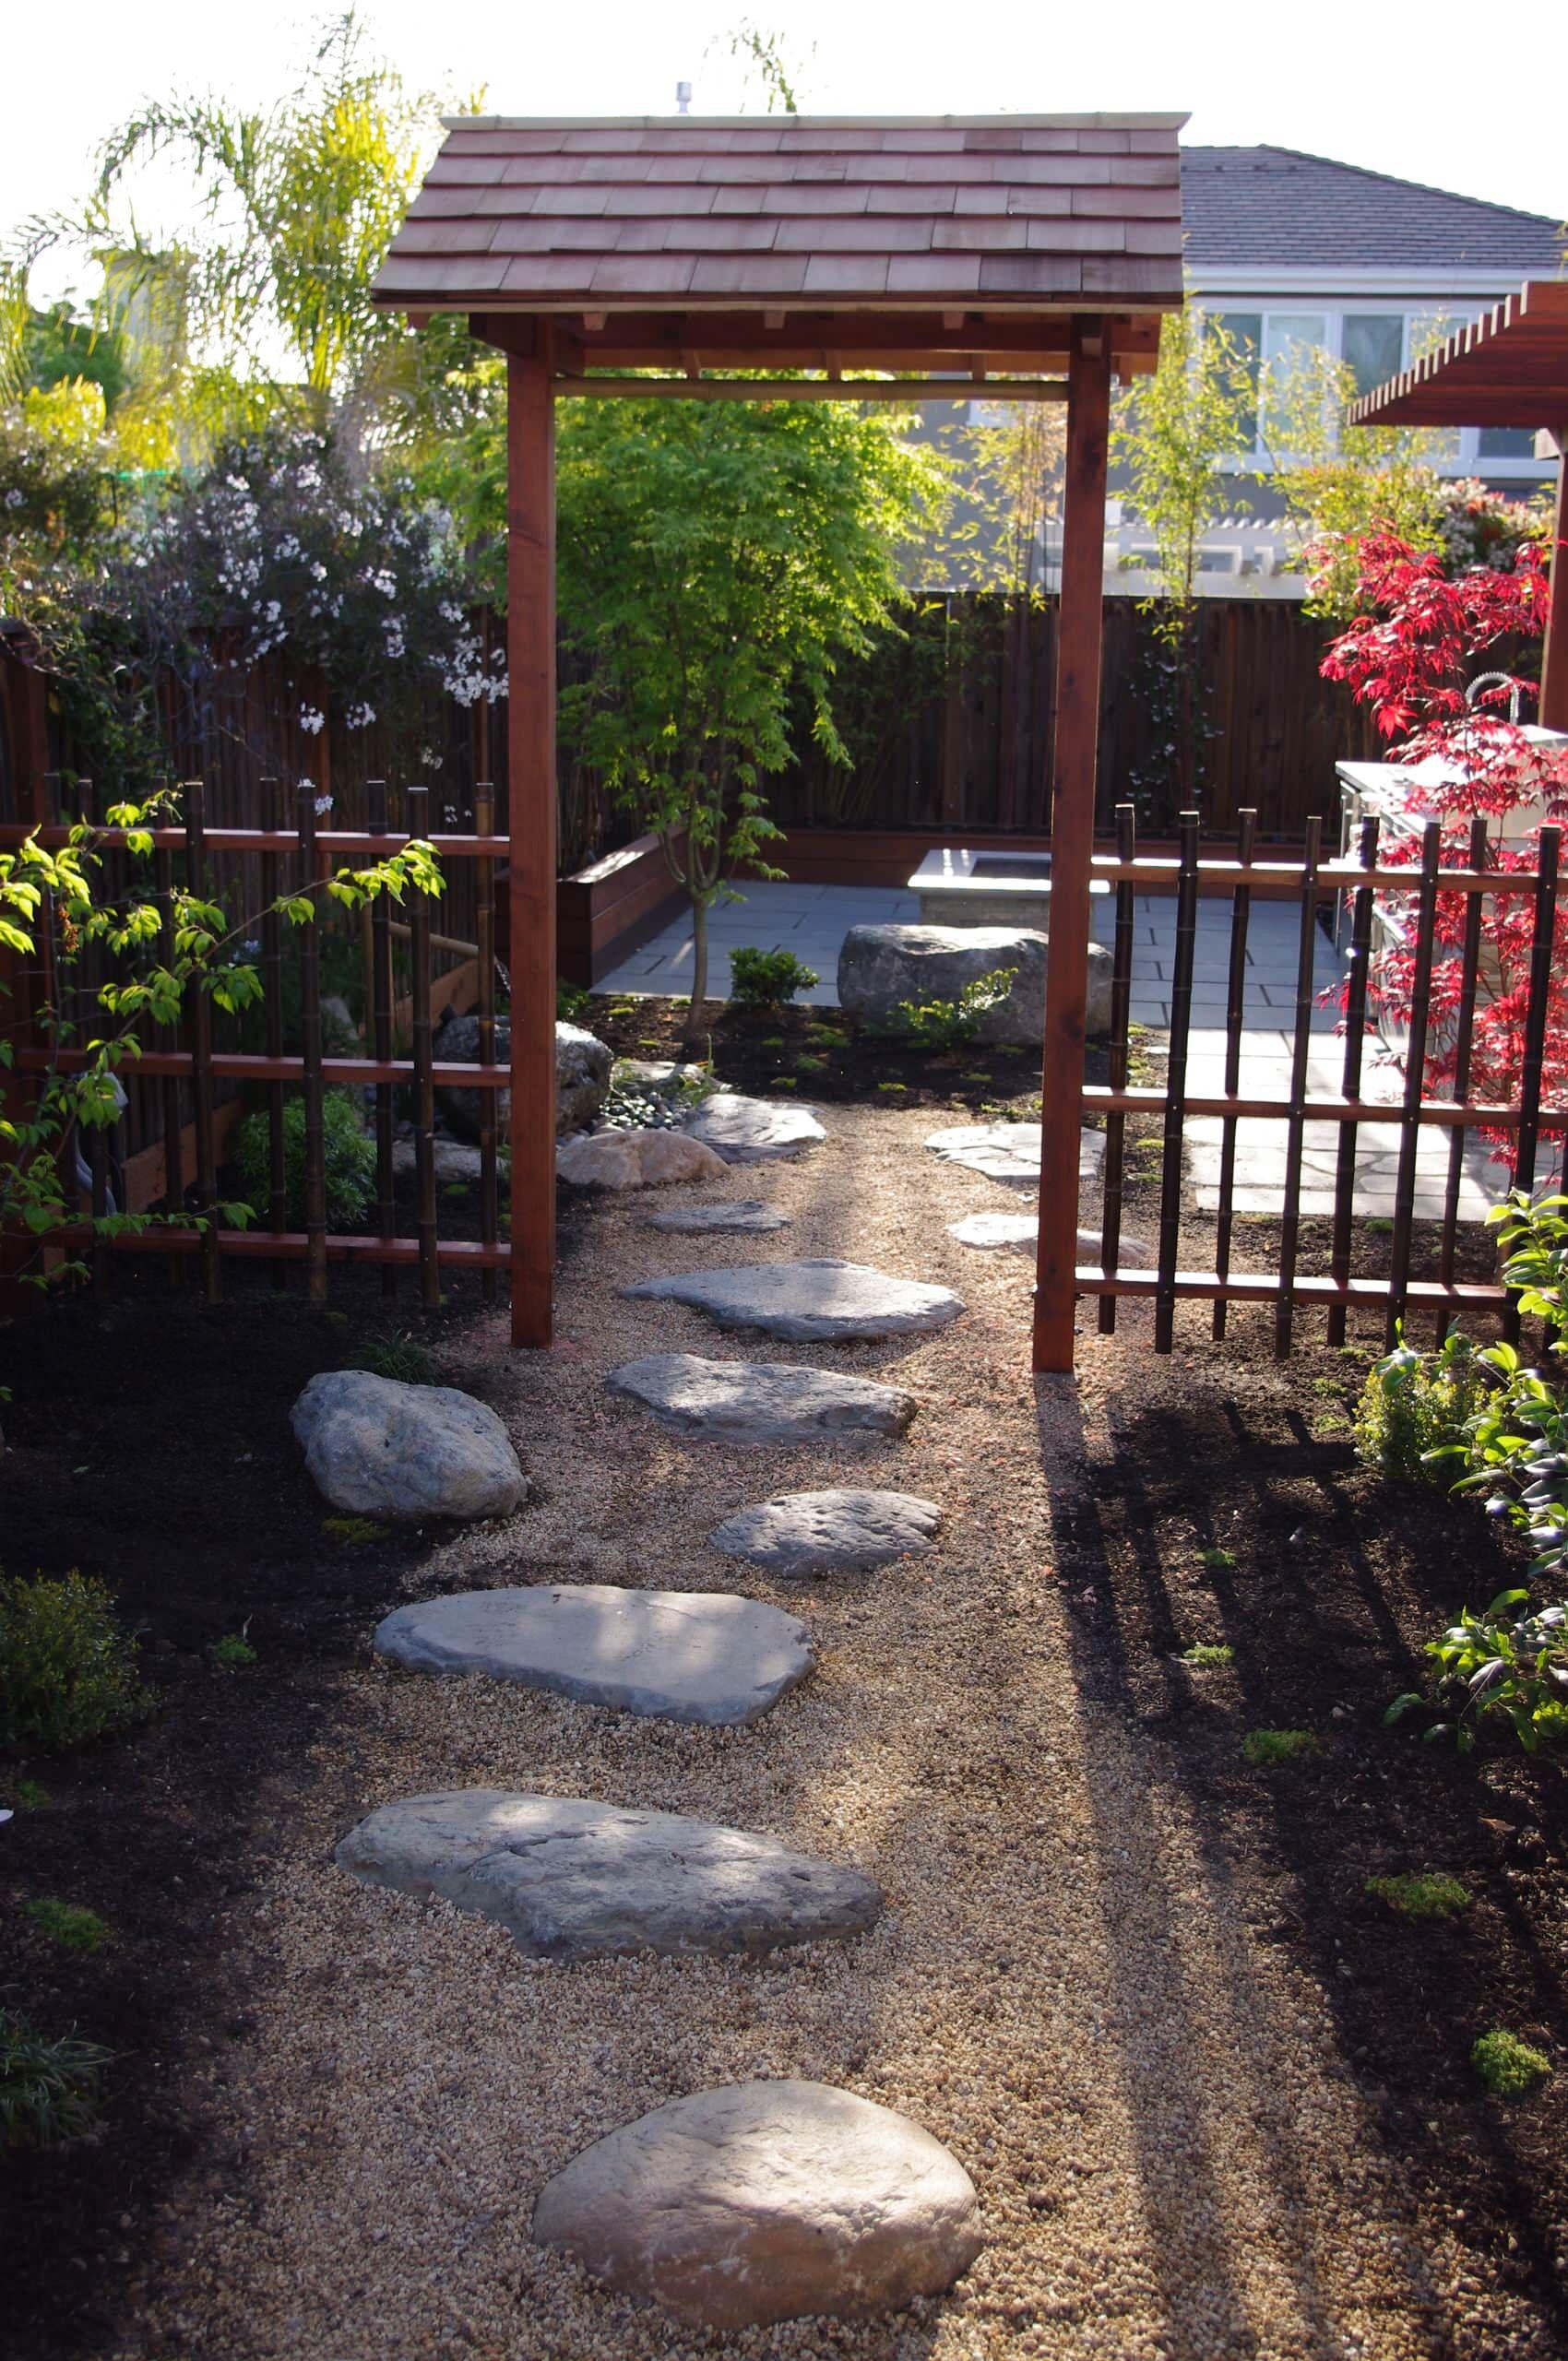 how to make a zen garden design in your backyard zen garden design in asian - How To Make A Zen Garden